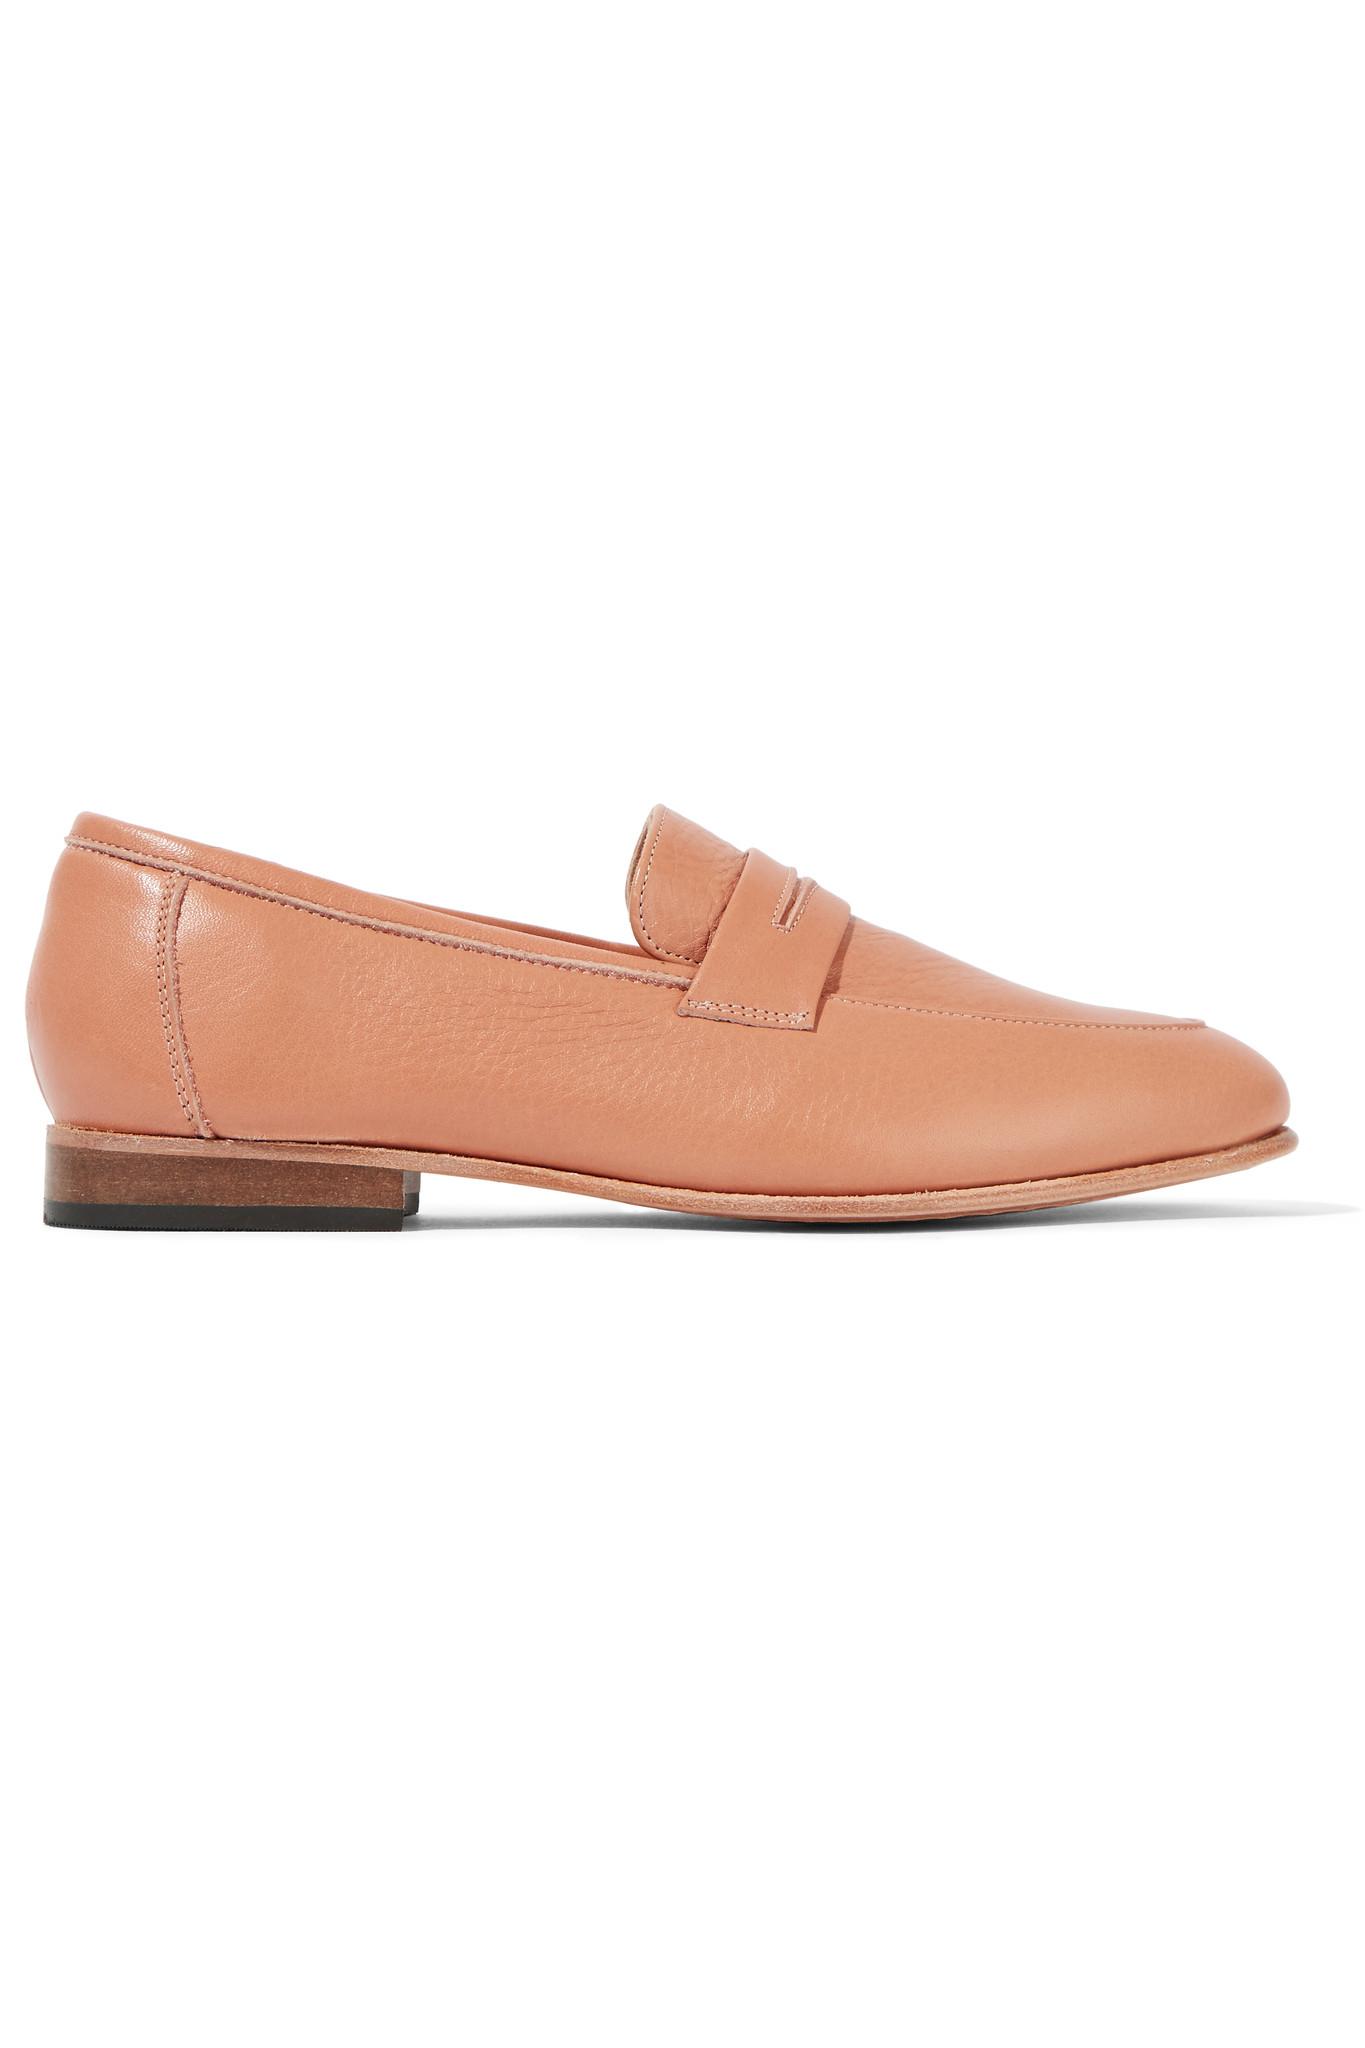 Sensible Shoes For Fashionable Women